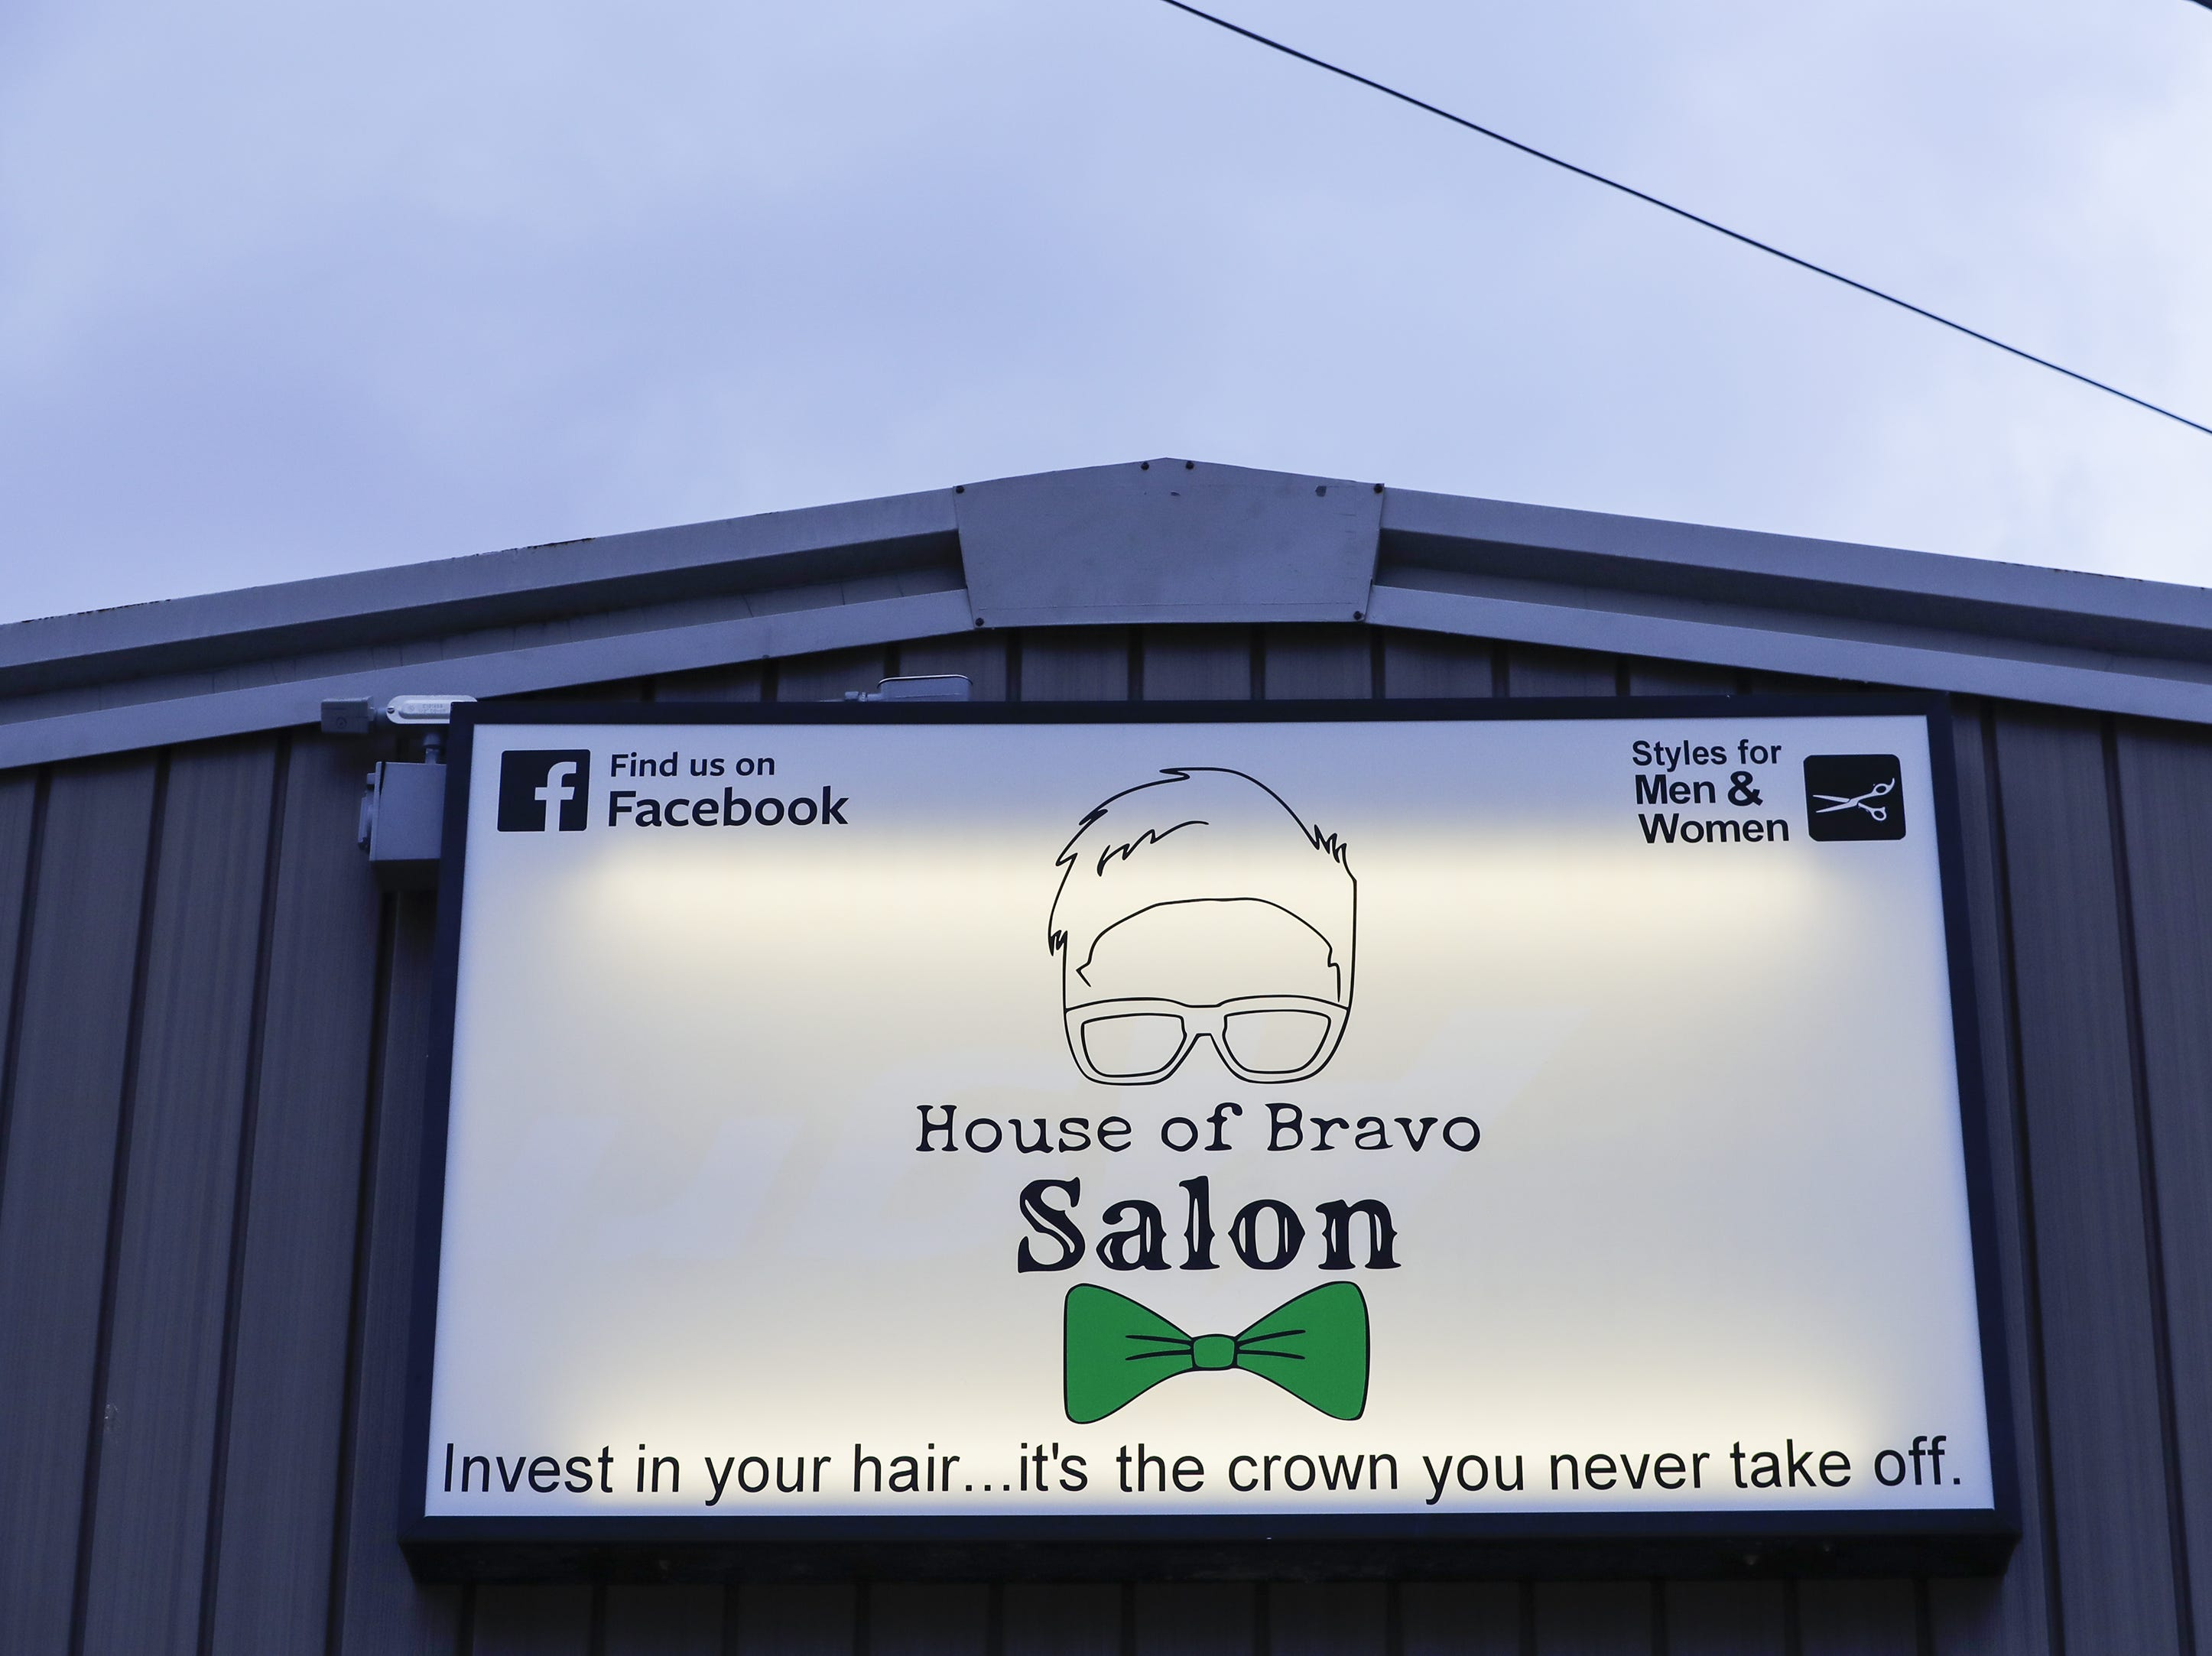 The logo for the House of Bravo Salon uses Jevon Lemke's likeness Monday, April 1, 2019, in Brillion, Wisconsin.